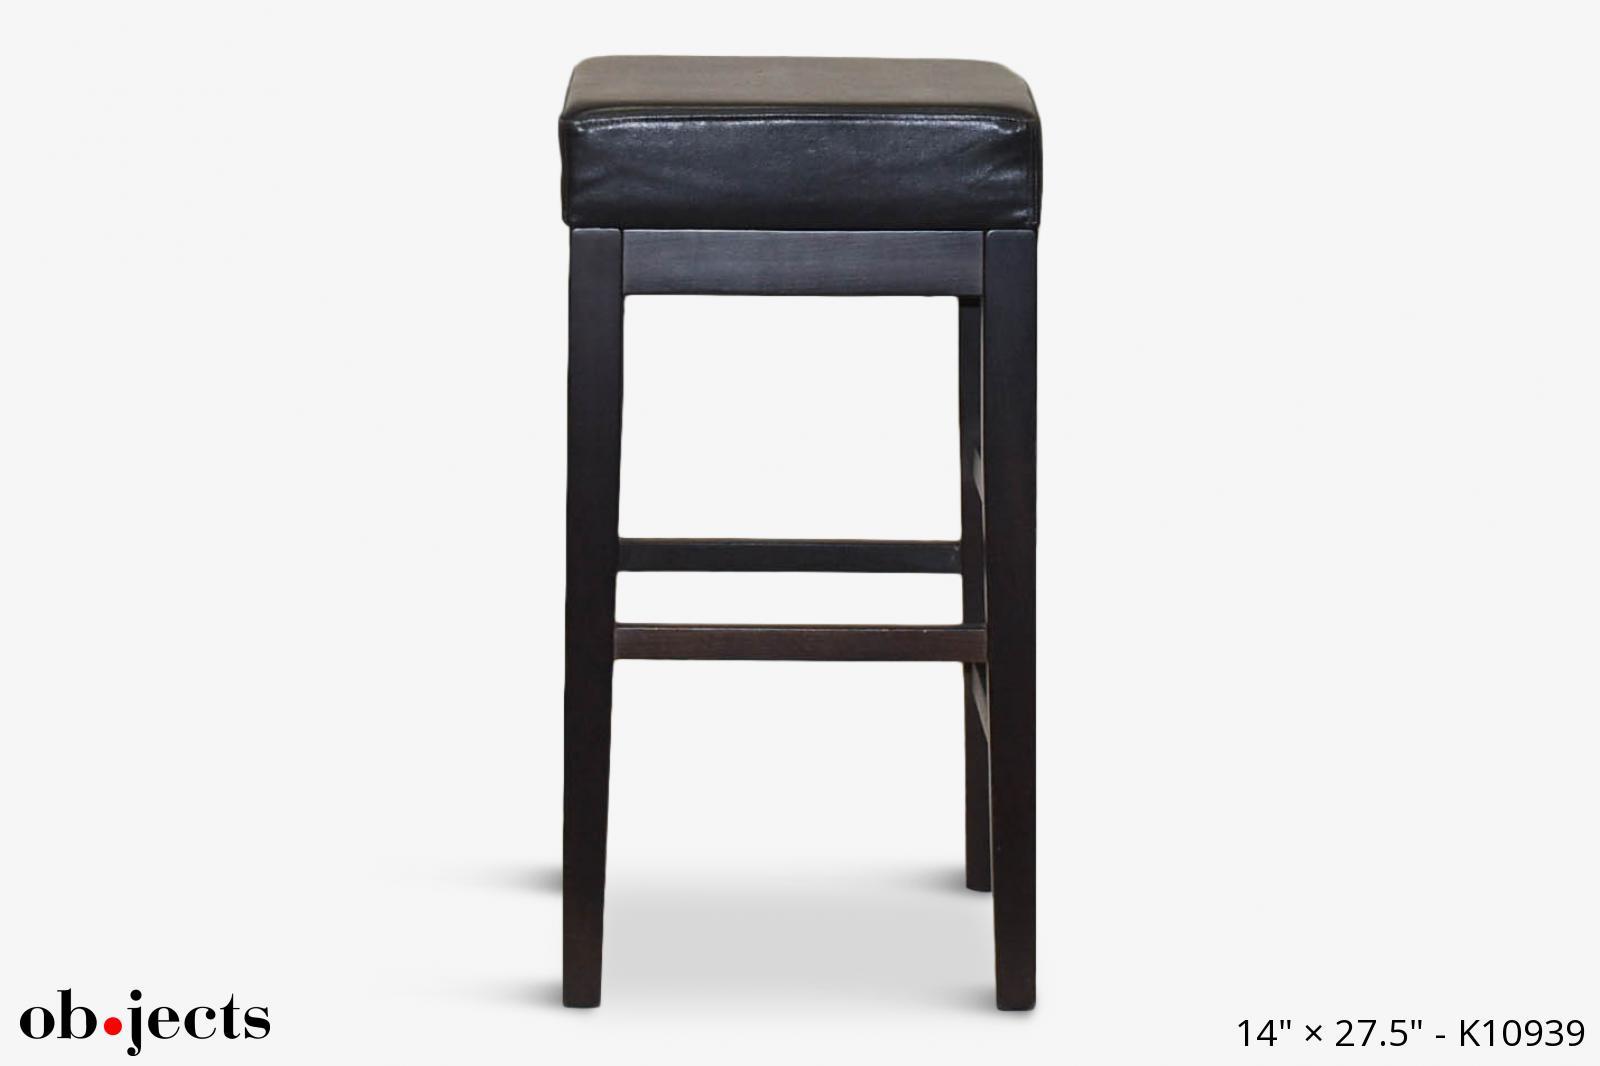 Sensational Stool Square Black Seat Dark Brown Legs Objects Ncnpc Chair Design For Home Ncnpcorg